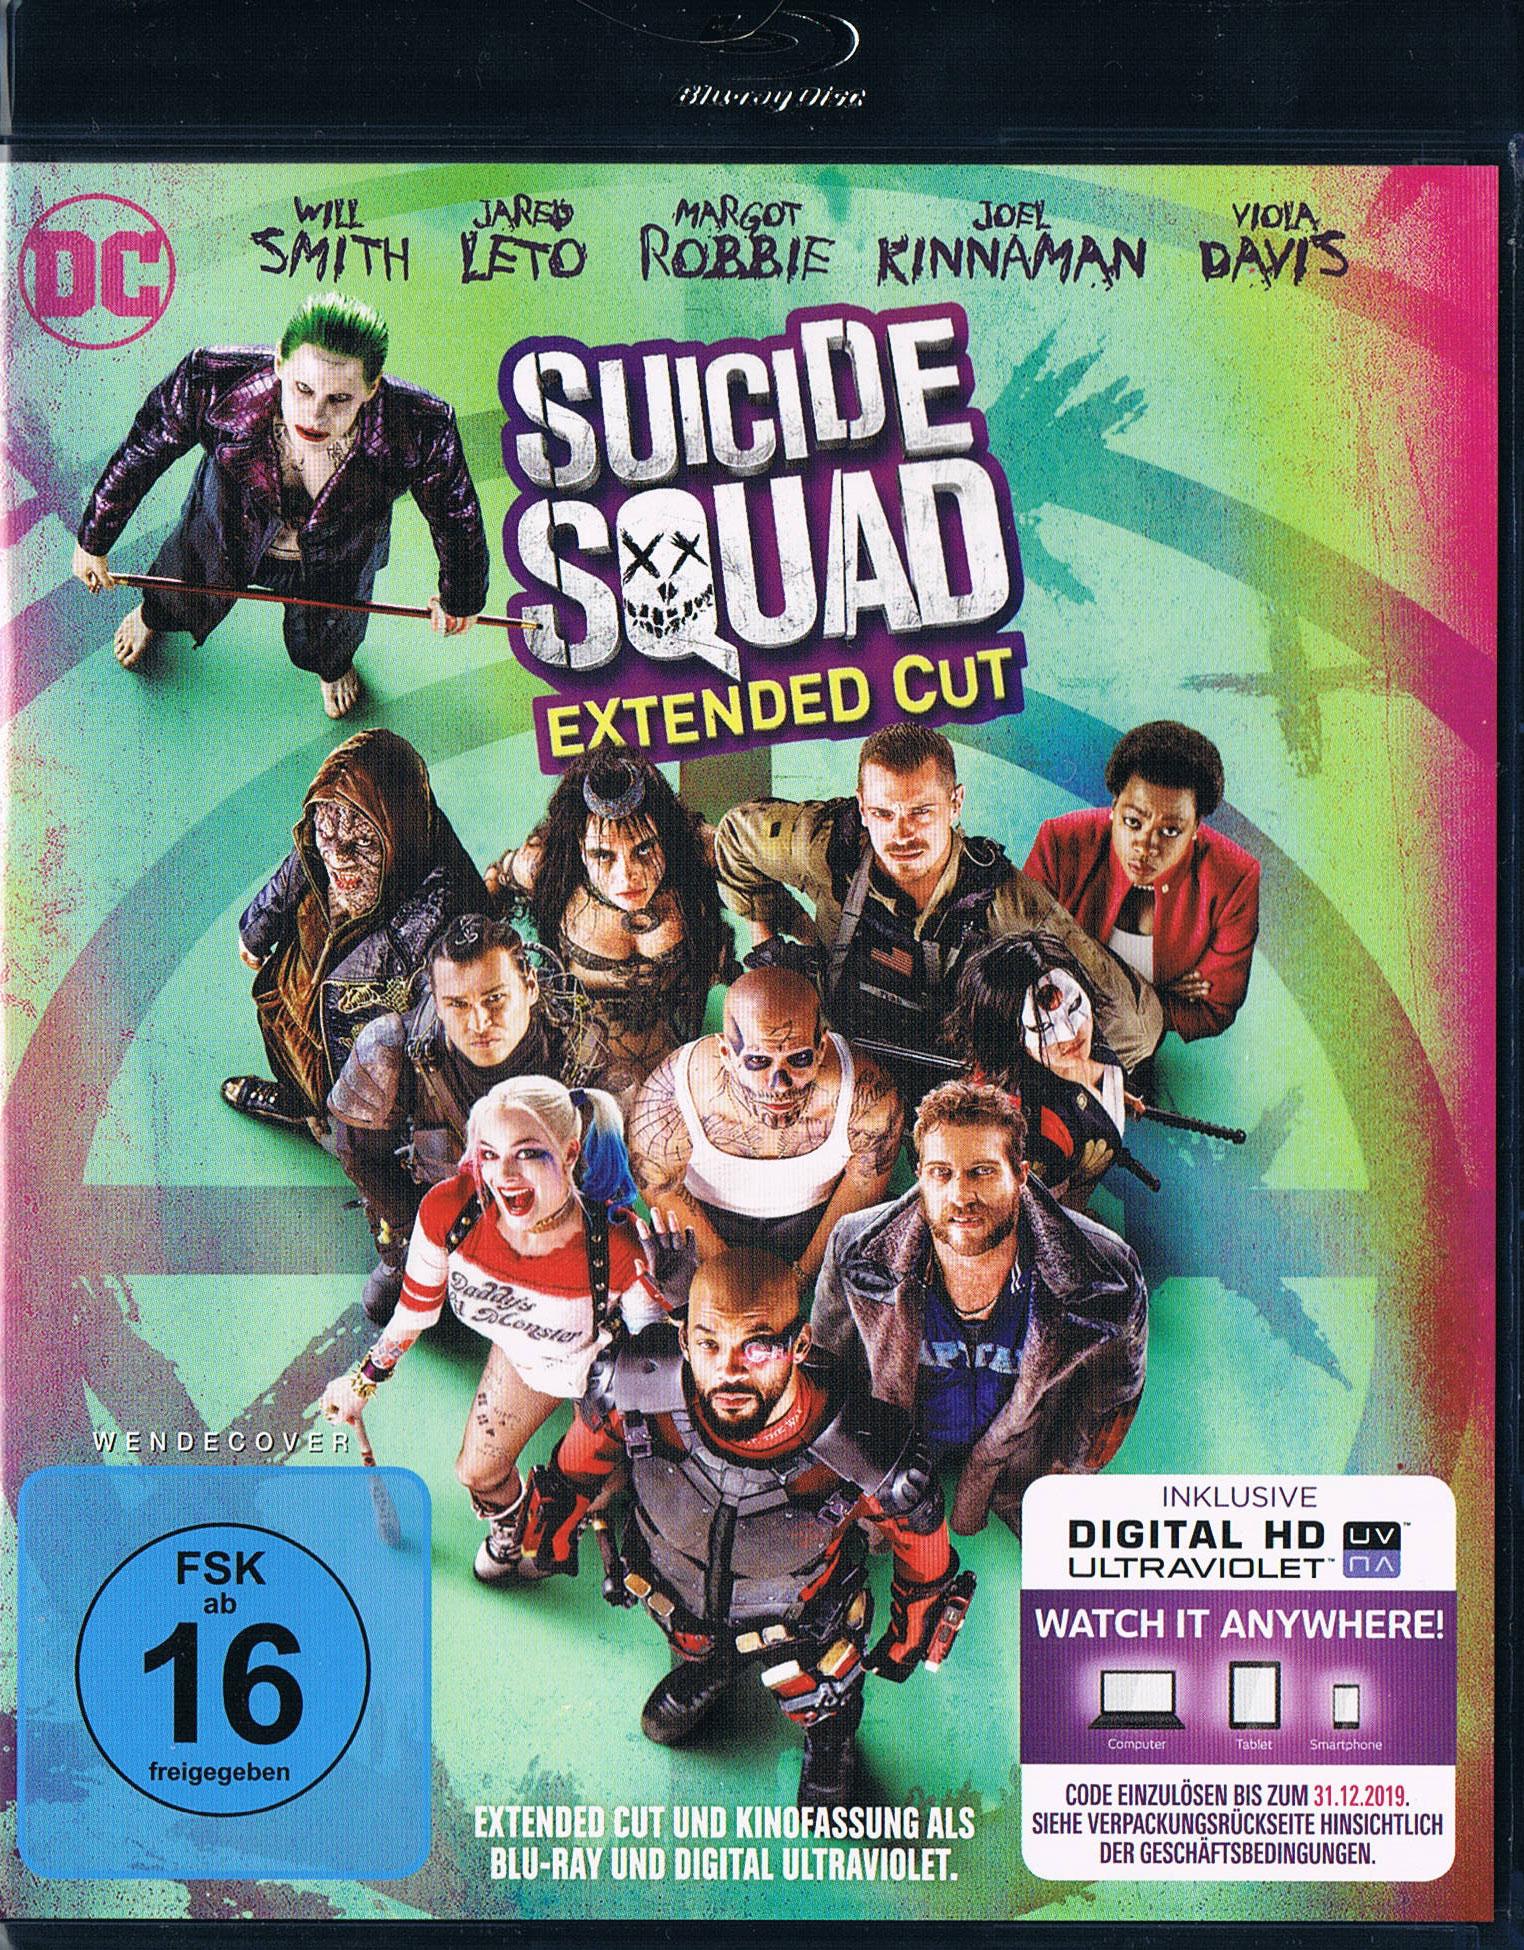 DCTV – Folge 078: Filmwoche 52/2016